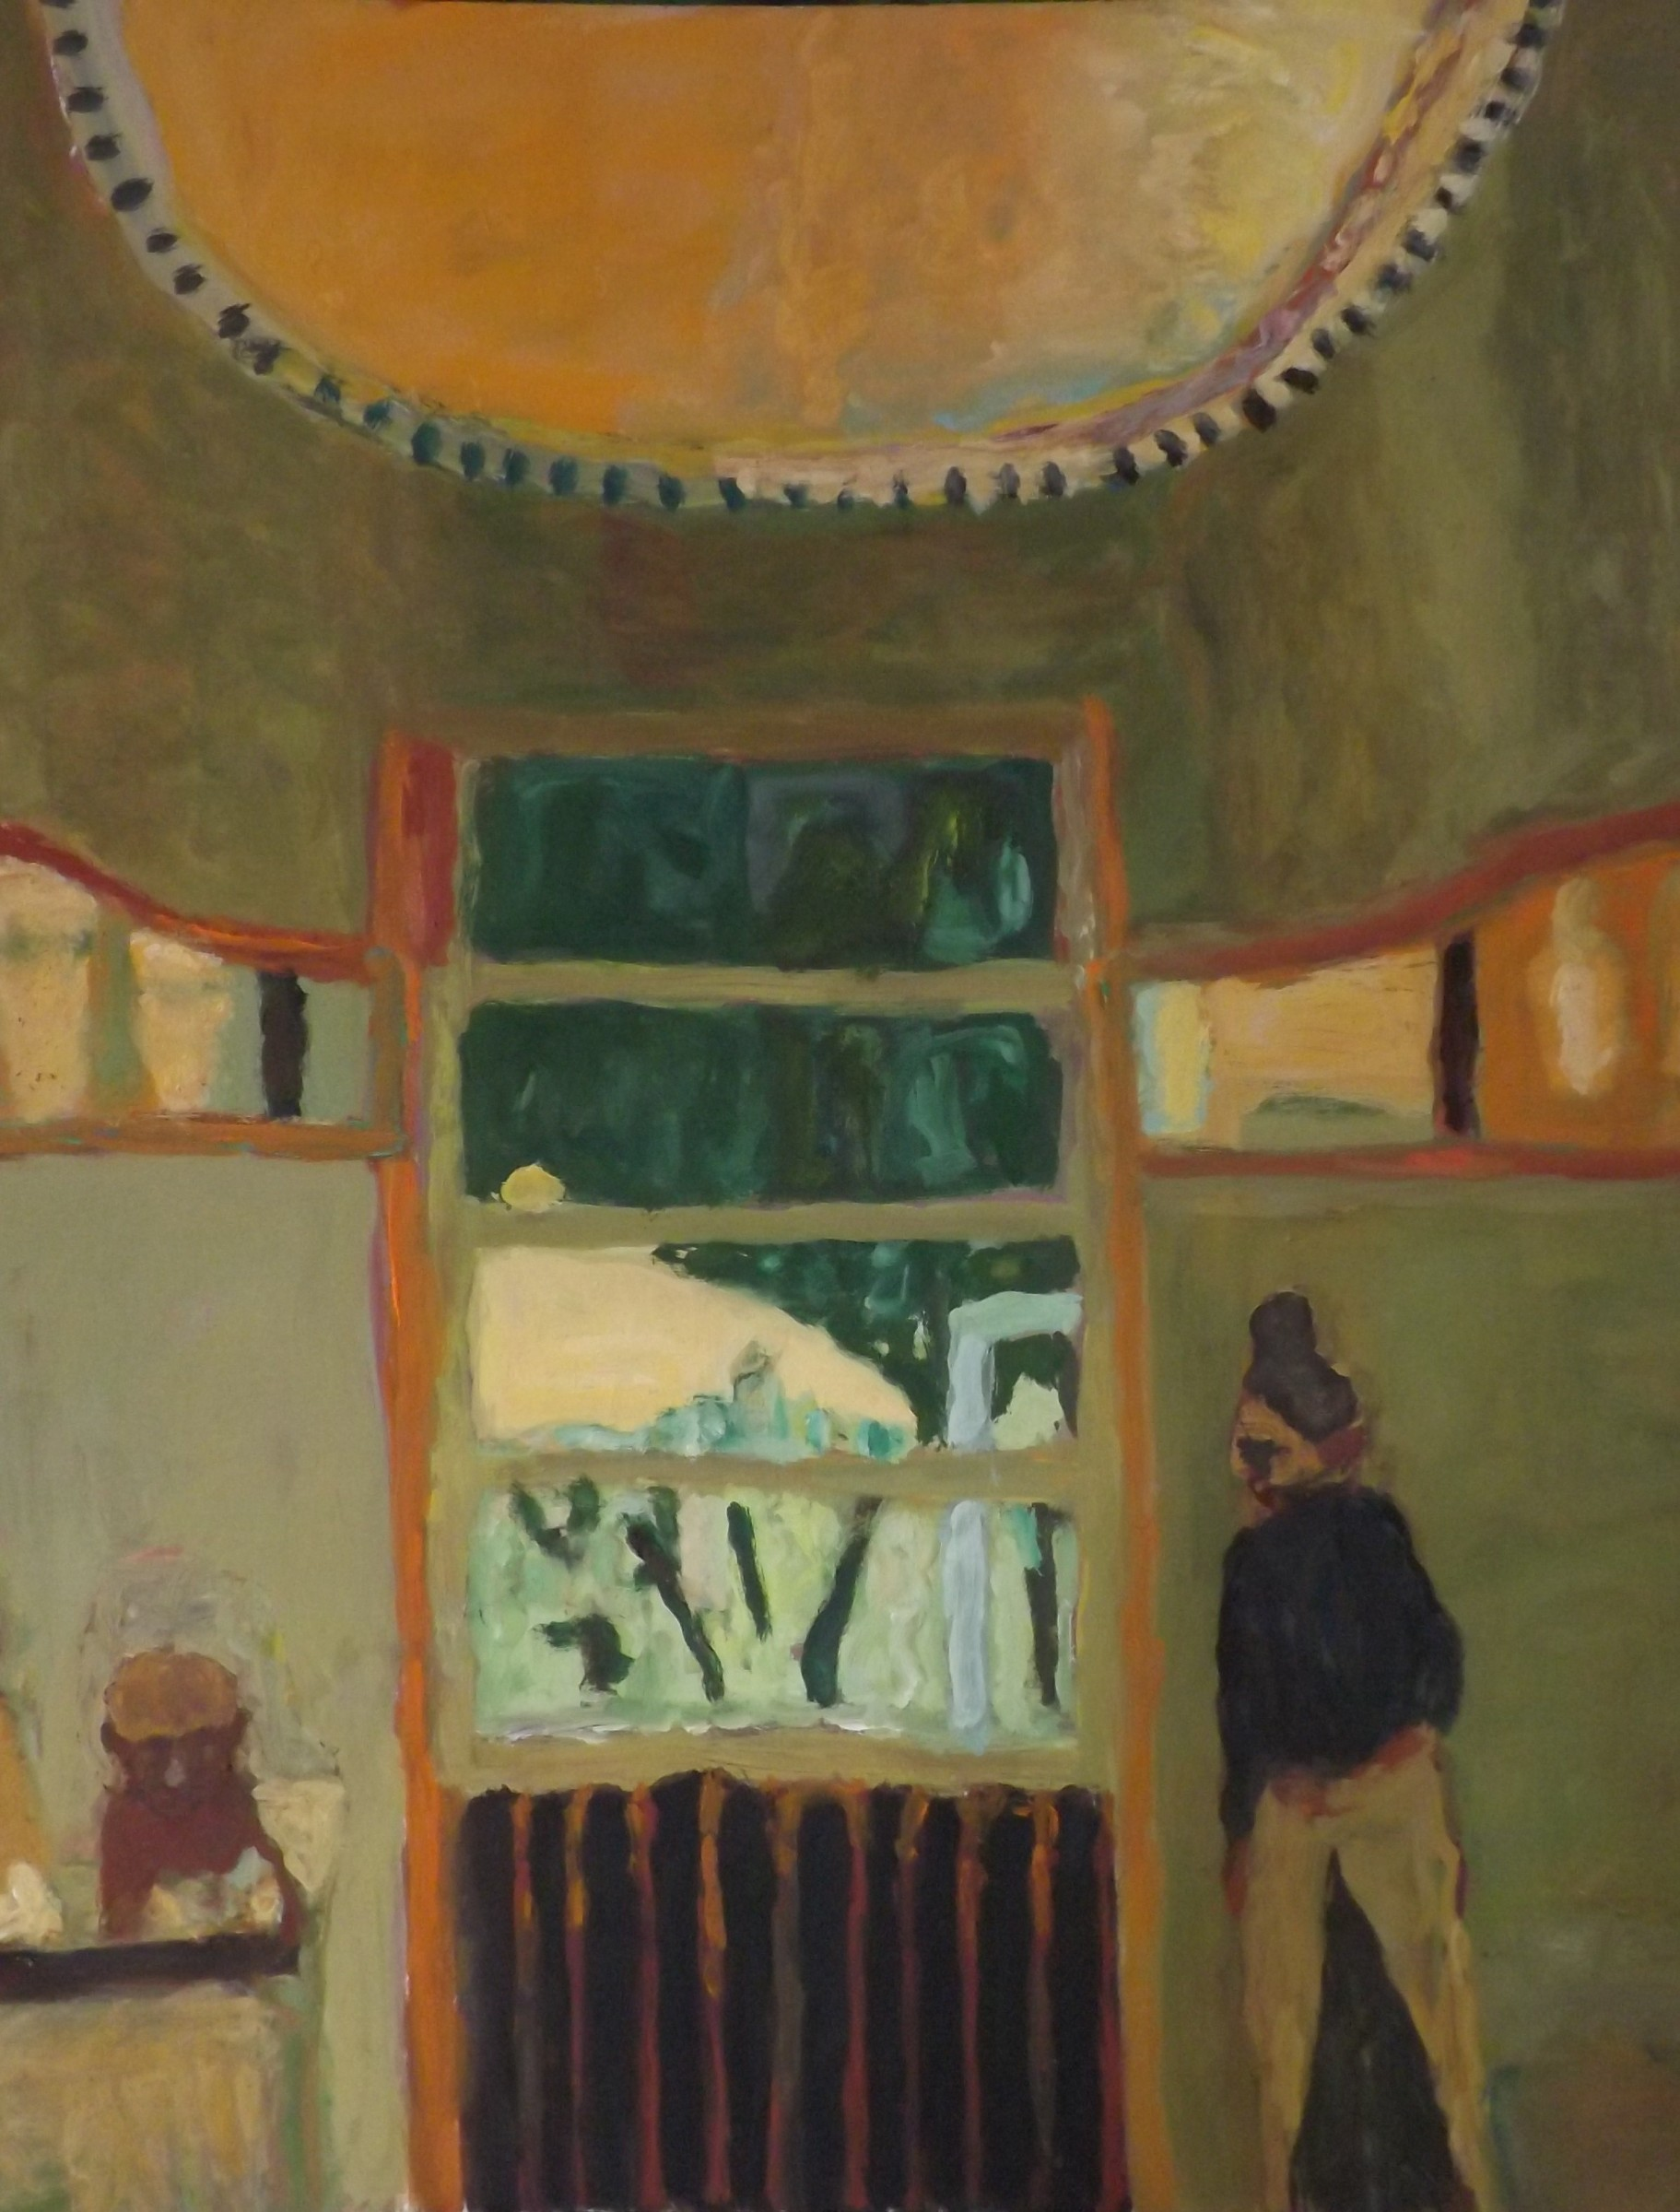 <span class=&#34;link fancybox-details-link&#34;><a href=&#34;/exhibitions/12/works/artworks_standalone9772/&#34;>View Detail Page</a></span><div class=&#34;artist&#34;><span class=&#34;artist&#34;><strong>Bridget Moore</strong></span></div><div class=&#34;title&#34;><em>Circus Restaurant                                                       </em></div><div class=&#34;medium&#34;>gouache</div>